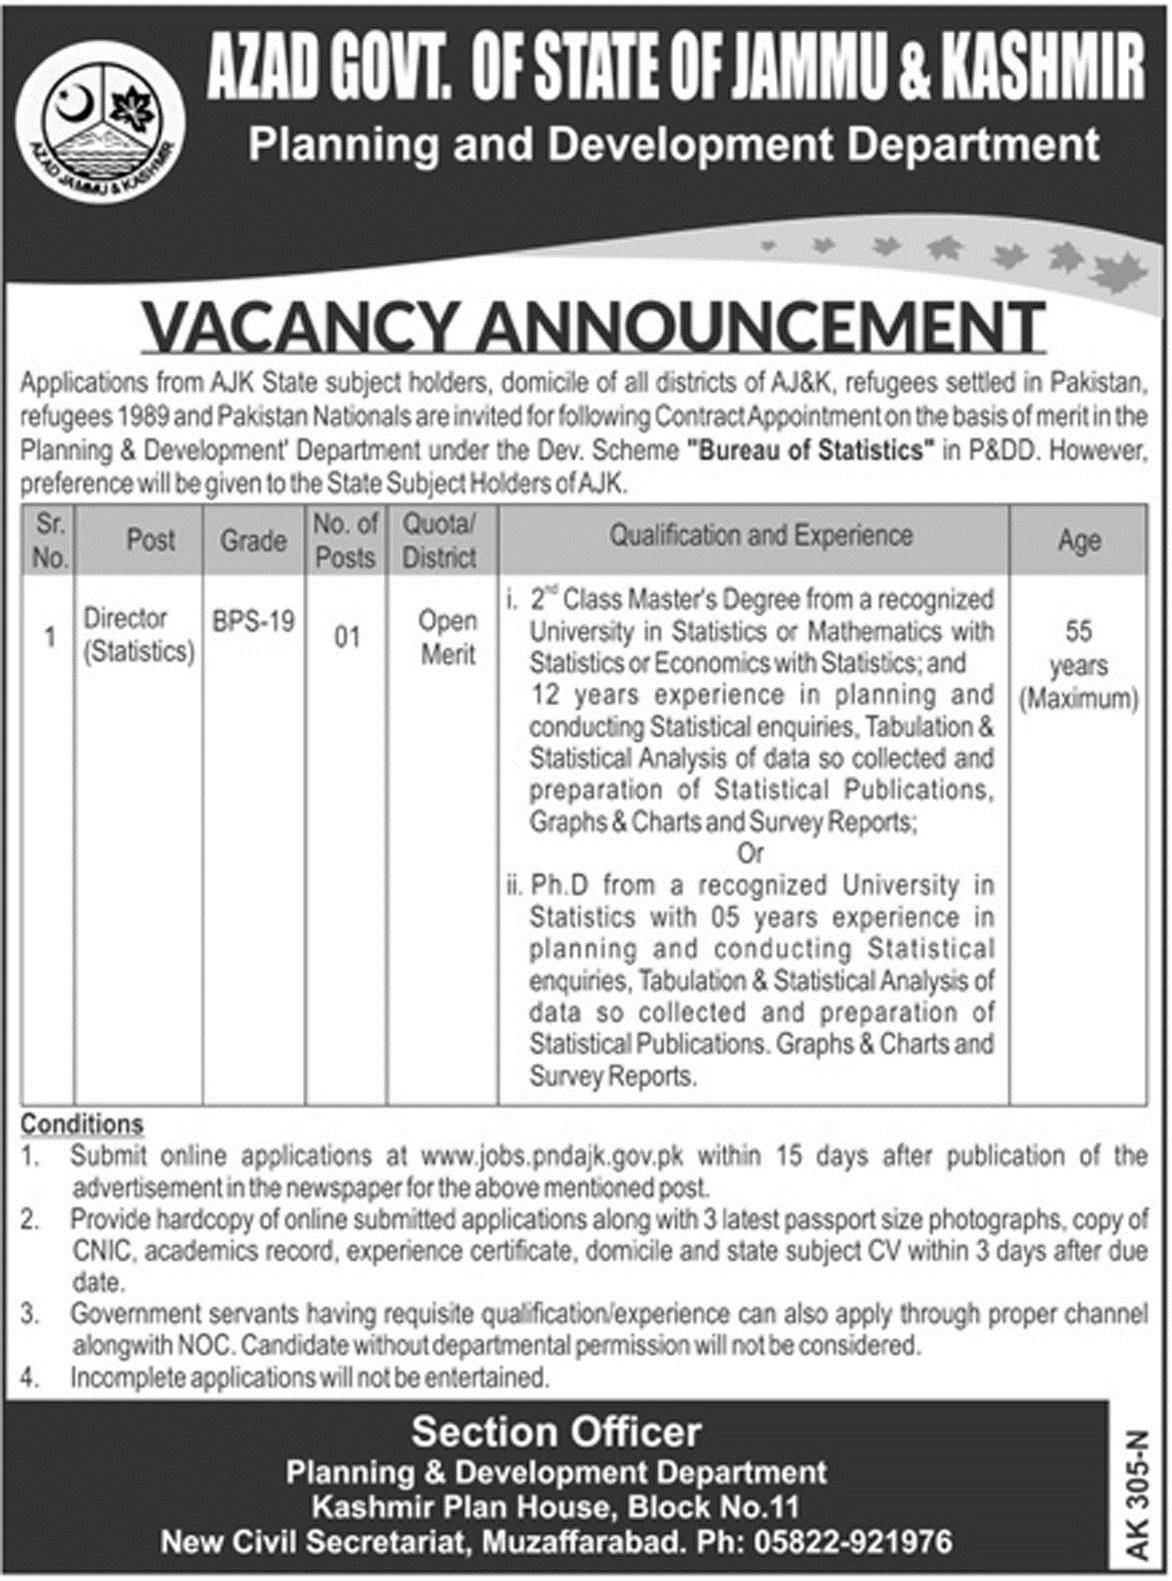 New Jobs in Azad Jamu Kashmir under Planning and Development Department 23 Jan 2018